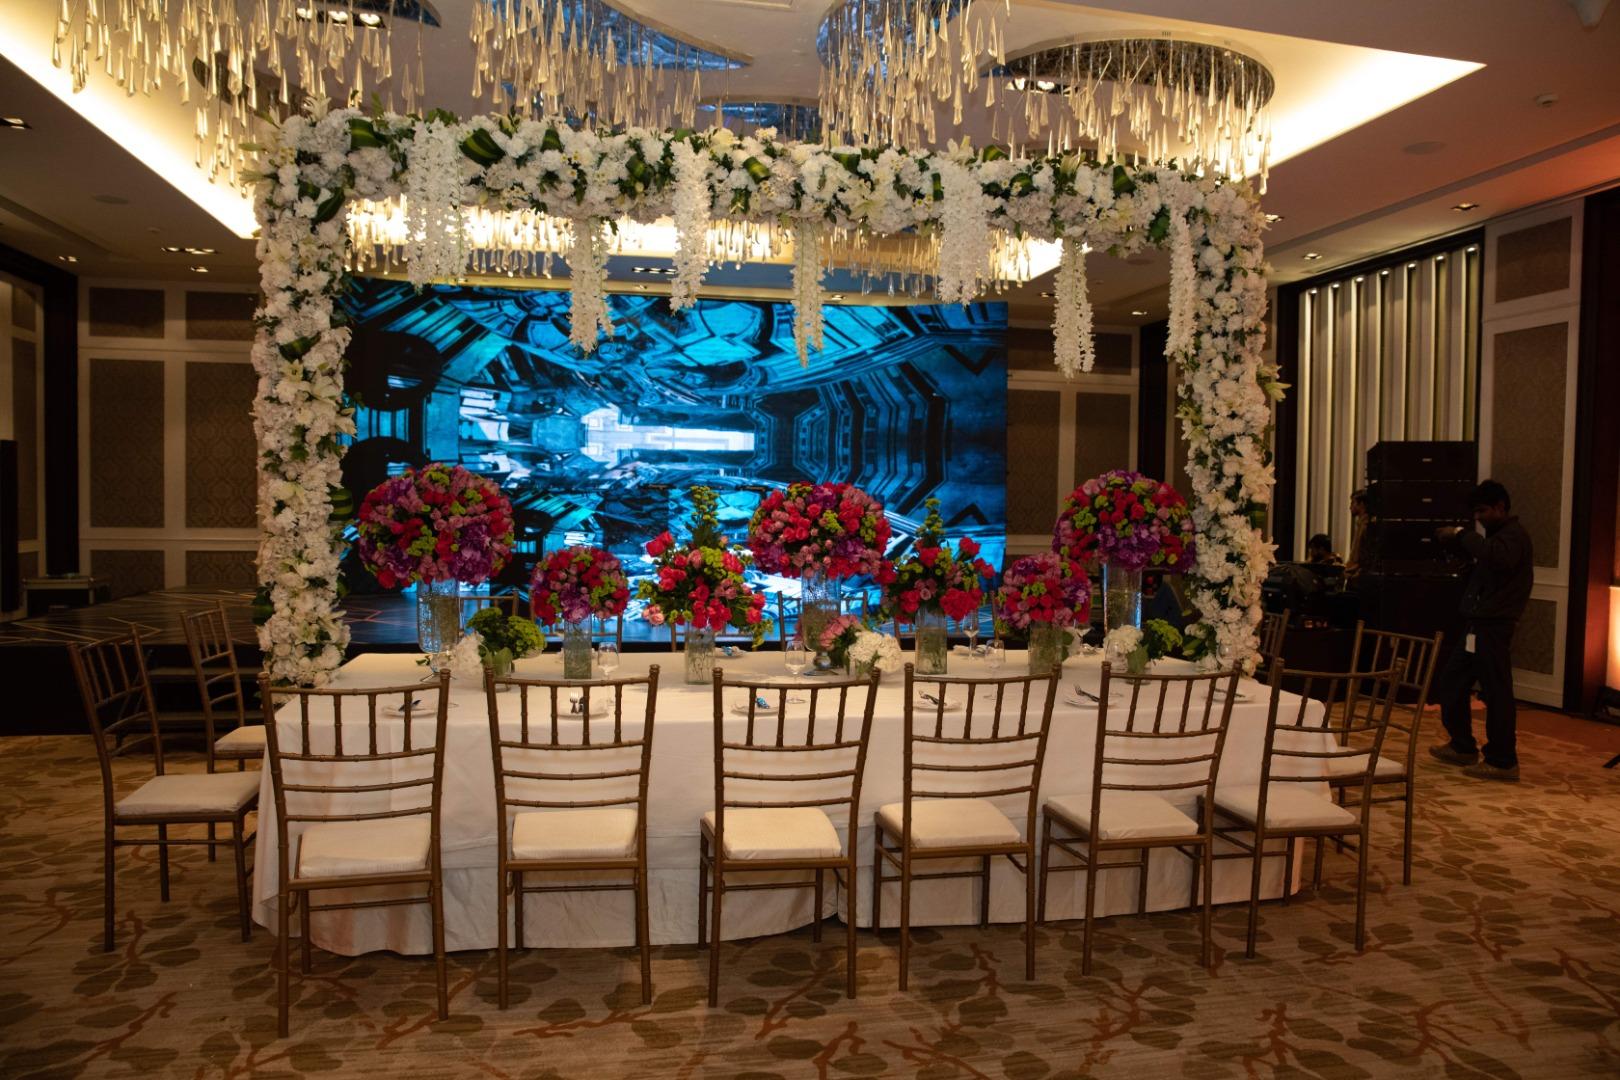 Dinner Table decor for Wedding Reception